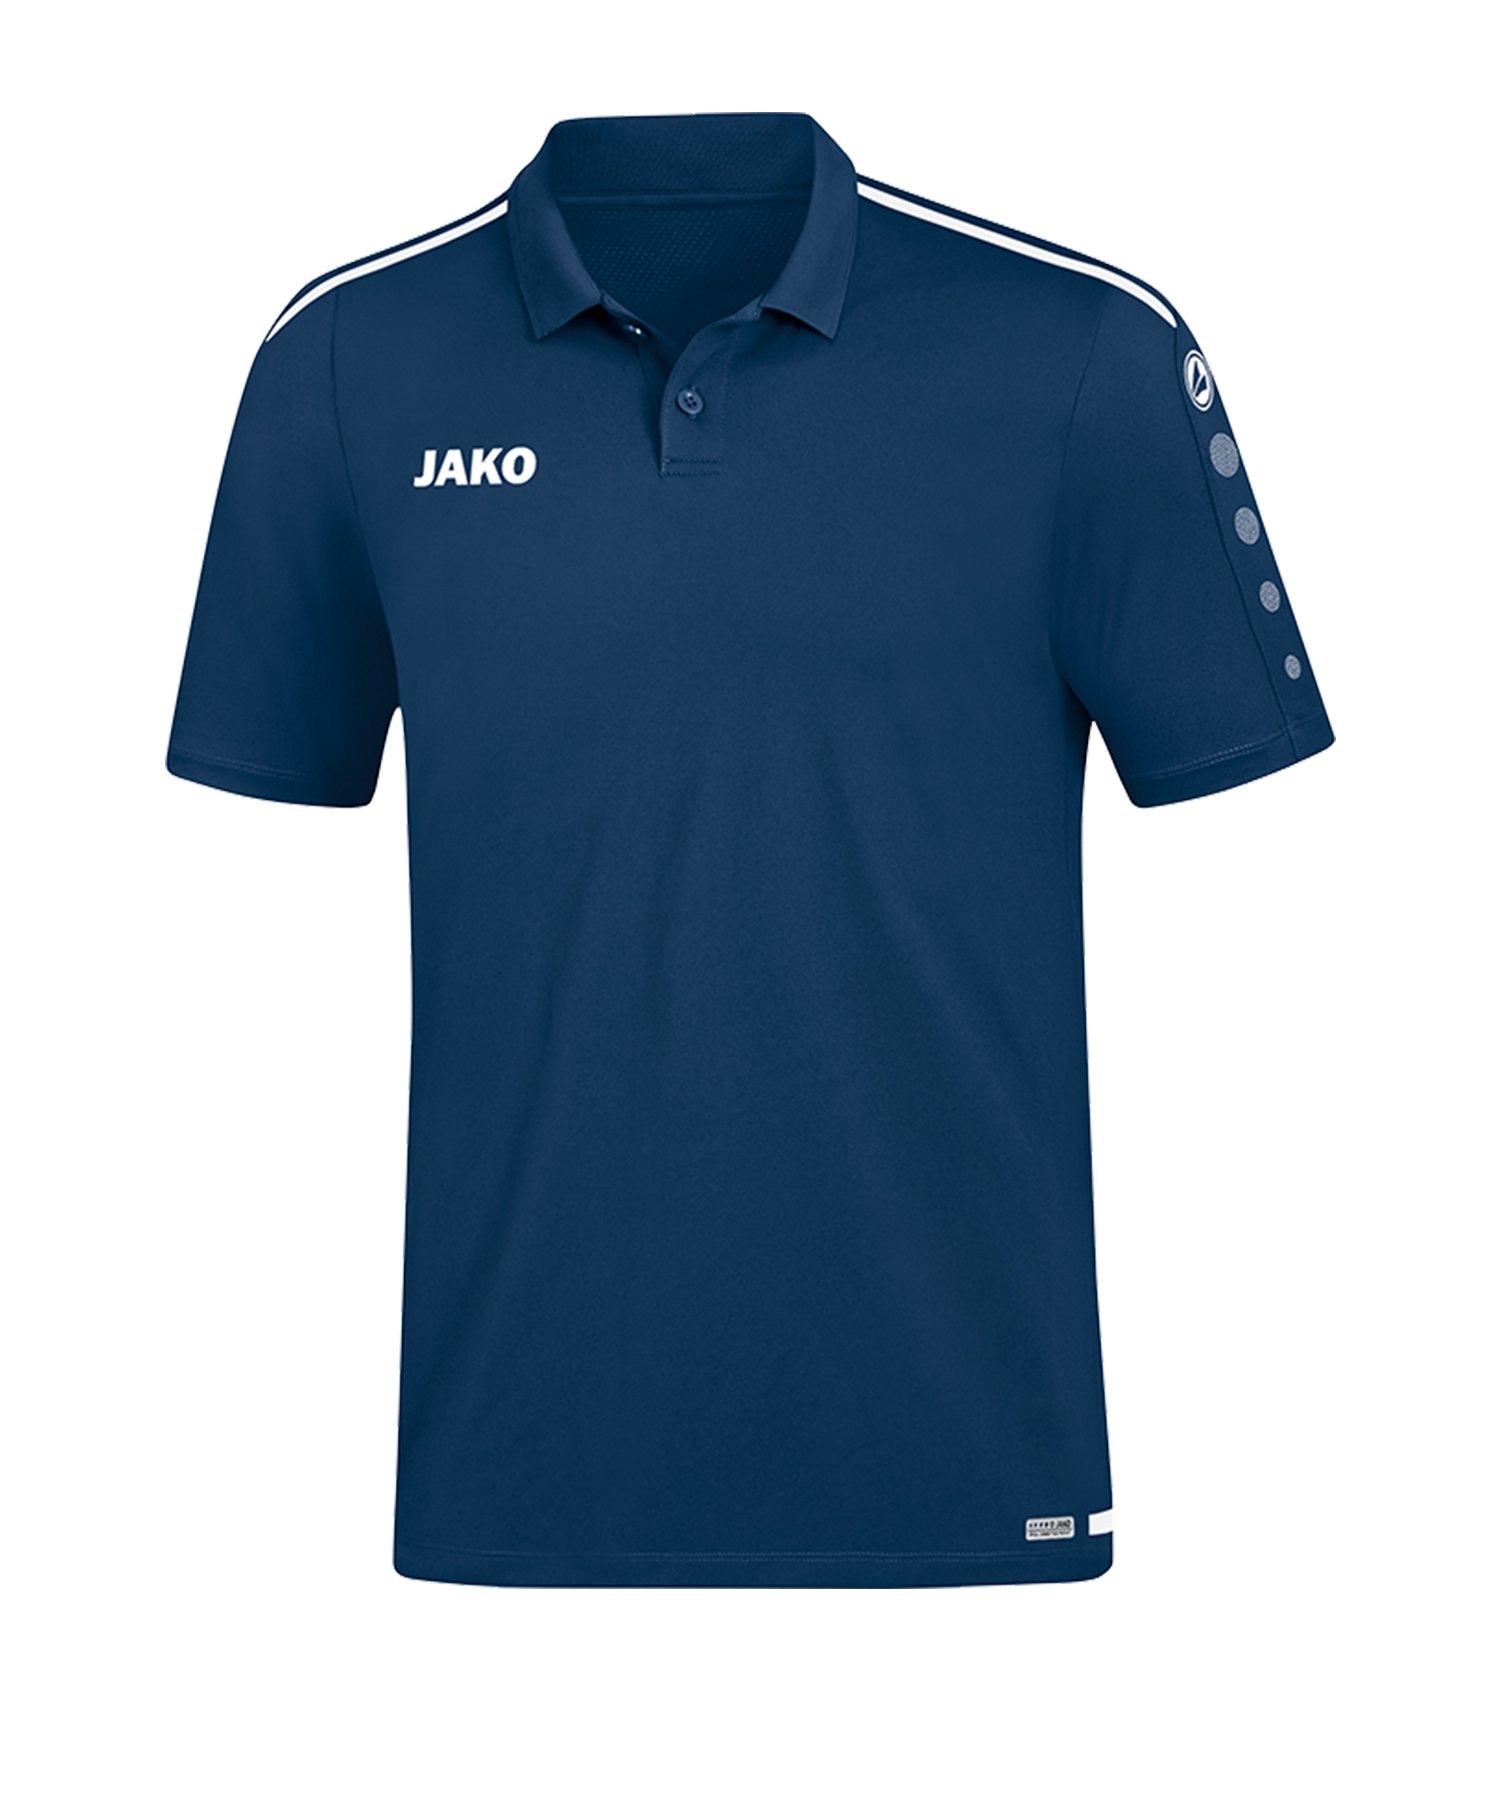 Jako Striker 2.0 Poloshirt Blau Weiss F99 - Blau